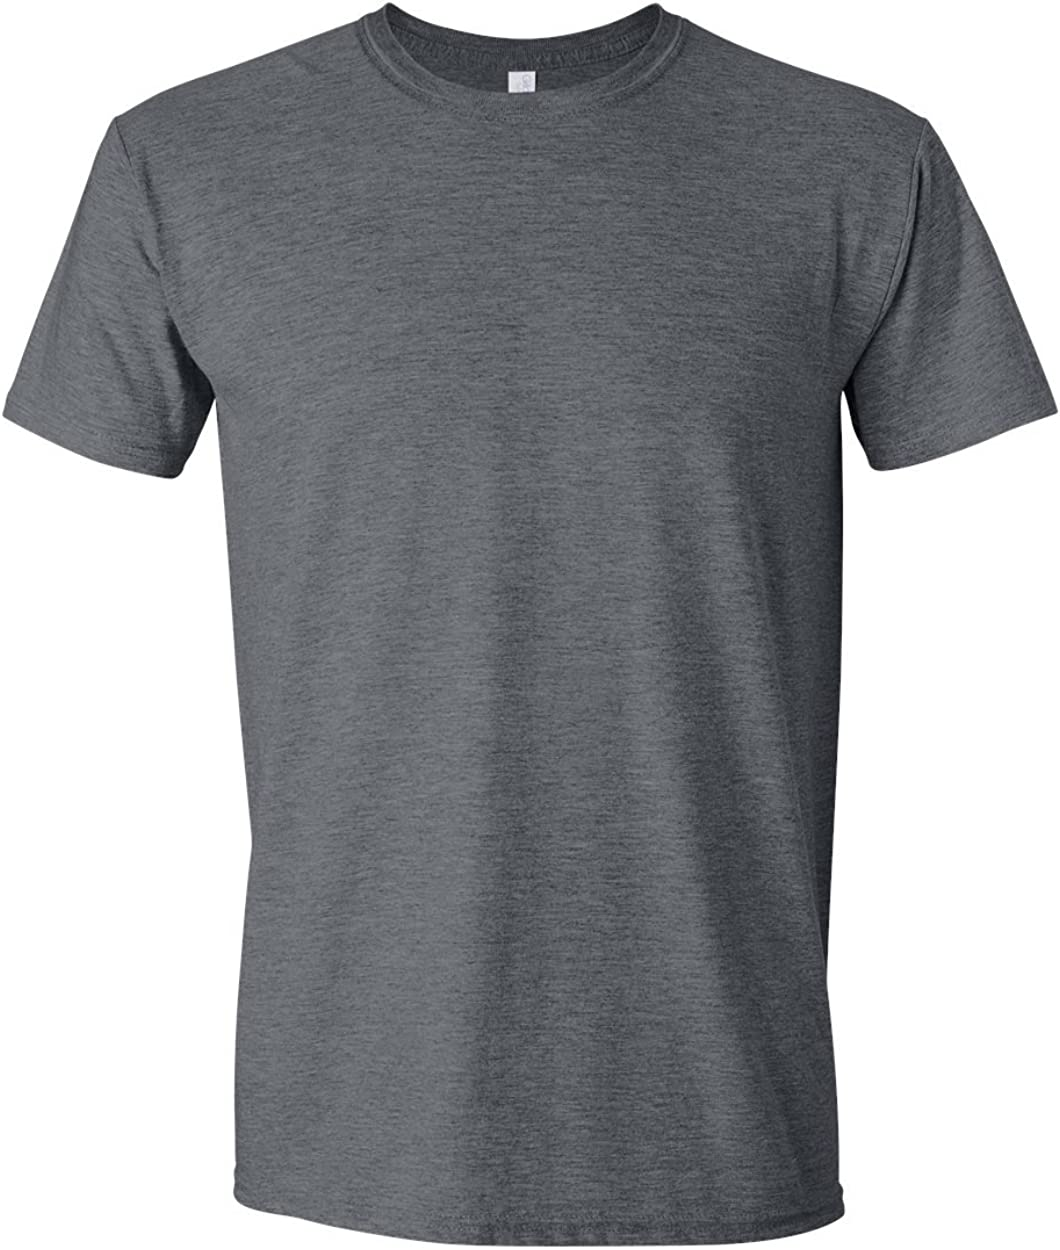 4.5 oz. T-Shirt (G640) Dark Heather, S (Pack of 12)